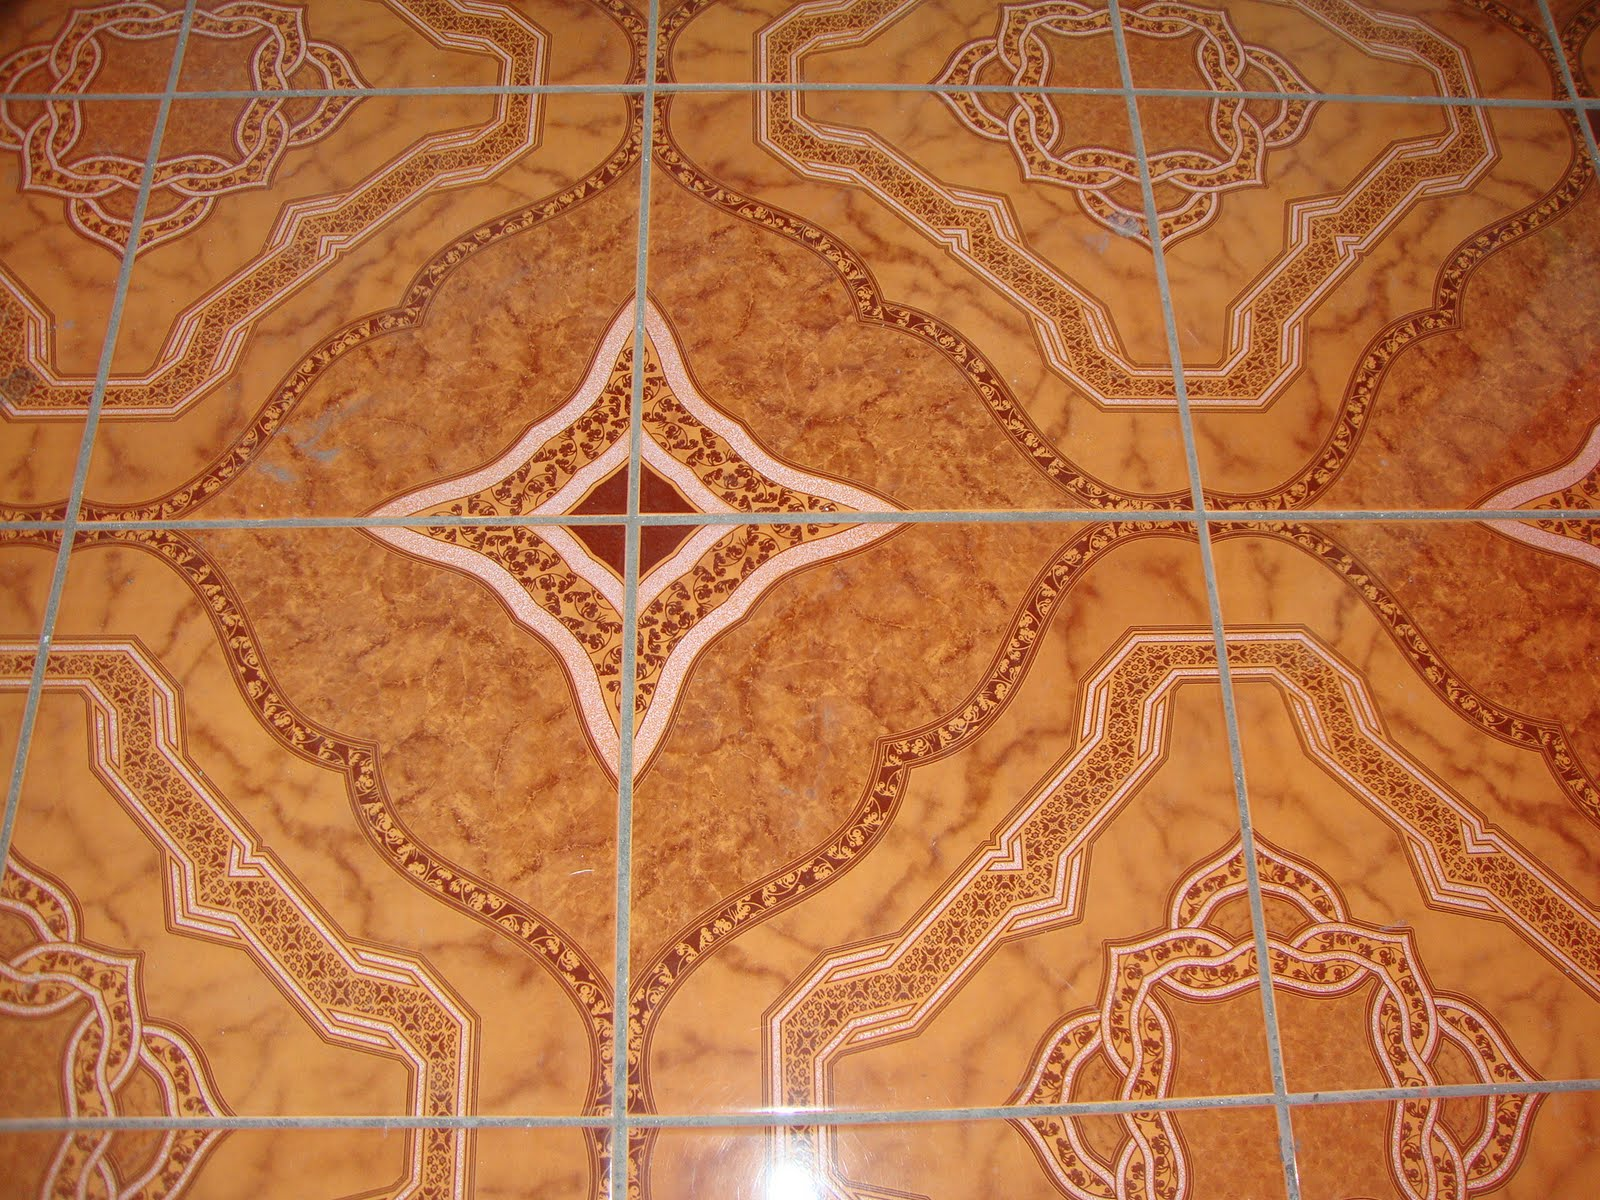 Abogado nicarag ense julio silva abril 2011 for Precios de pisos ceramicos